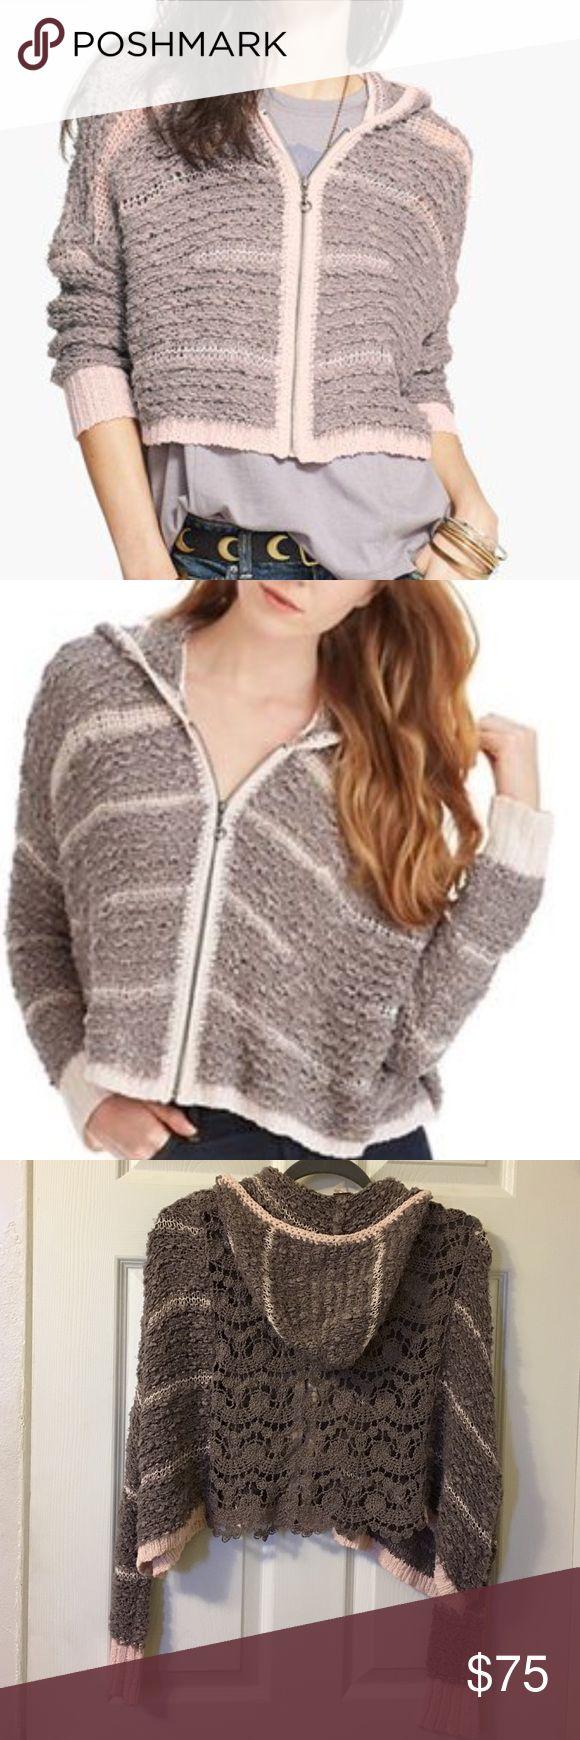 Free People Cecilia Crochet Hoodie In Like new condition. Very cute Free People Crochet back, knit zip up hoodie. Free People Sweaters Cardigans